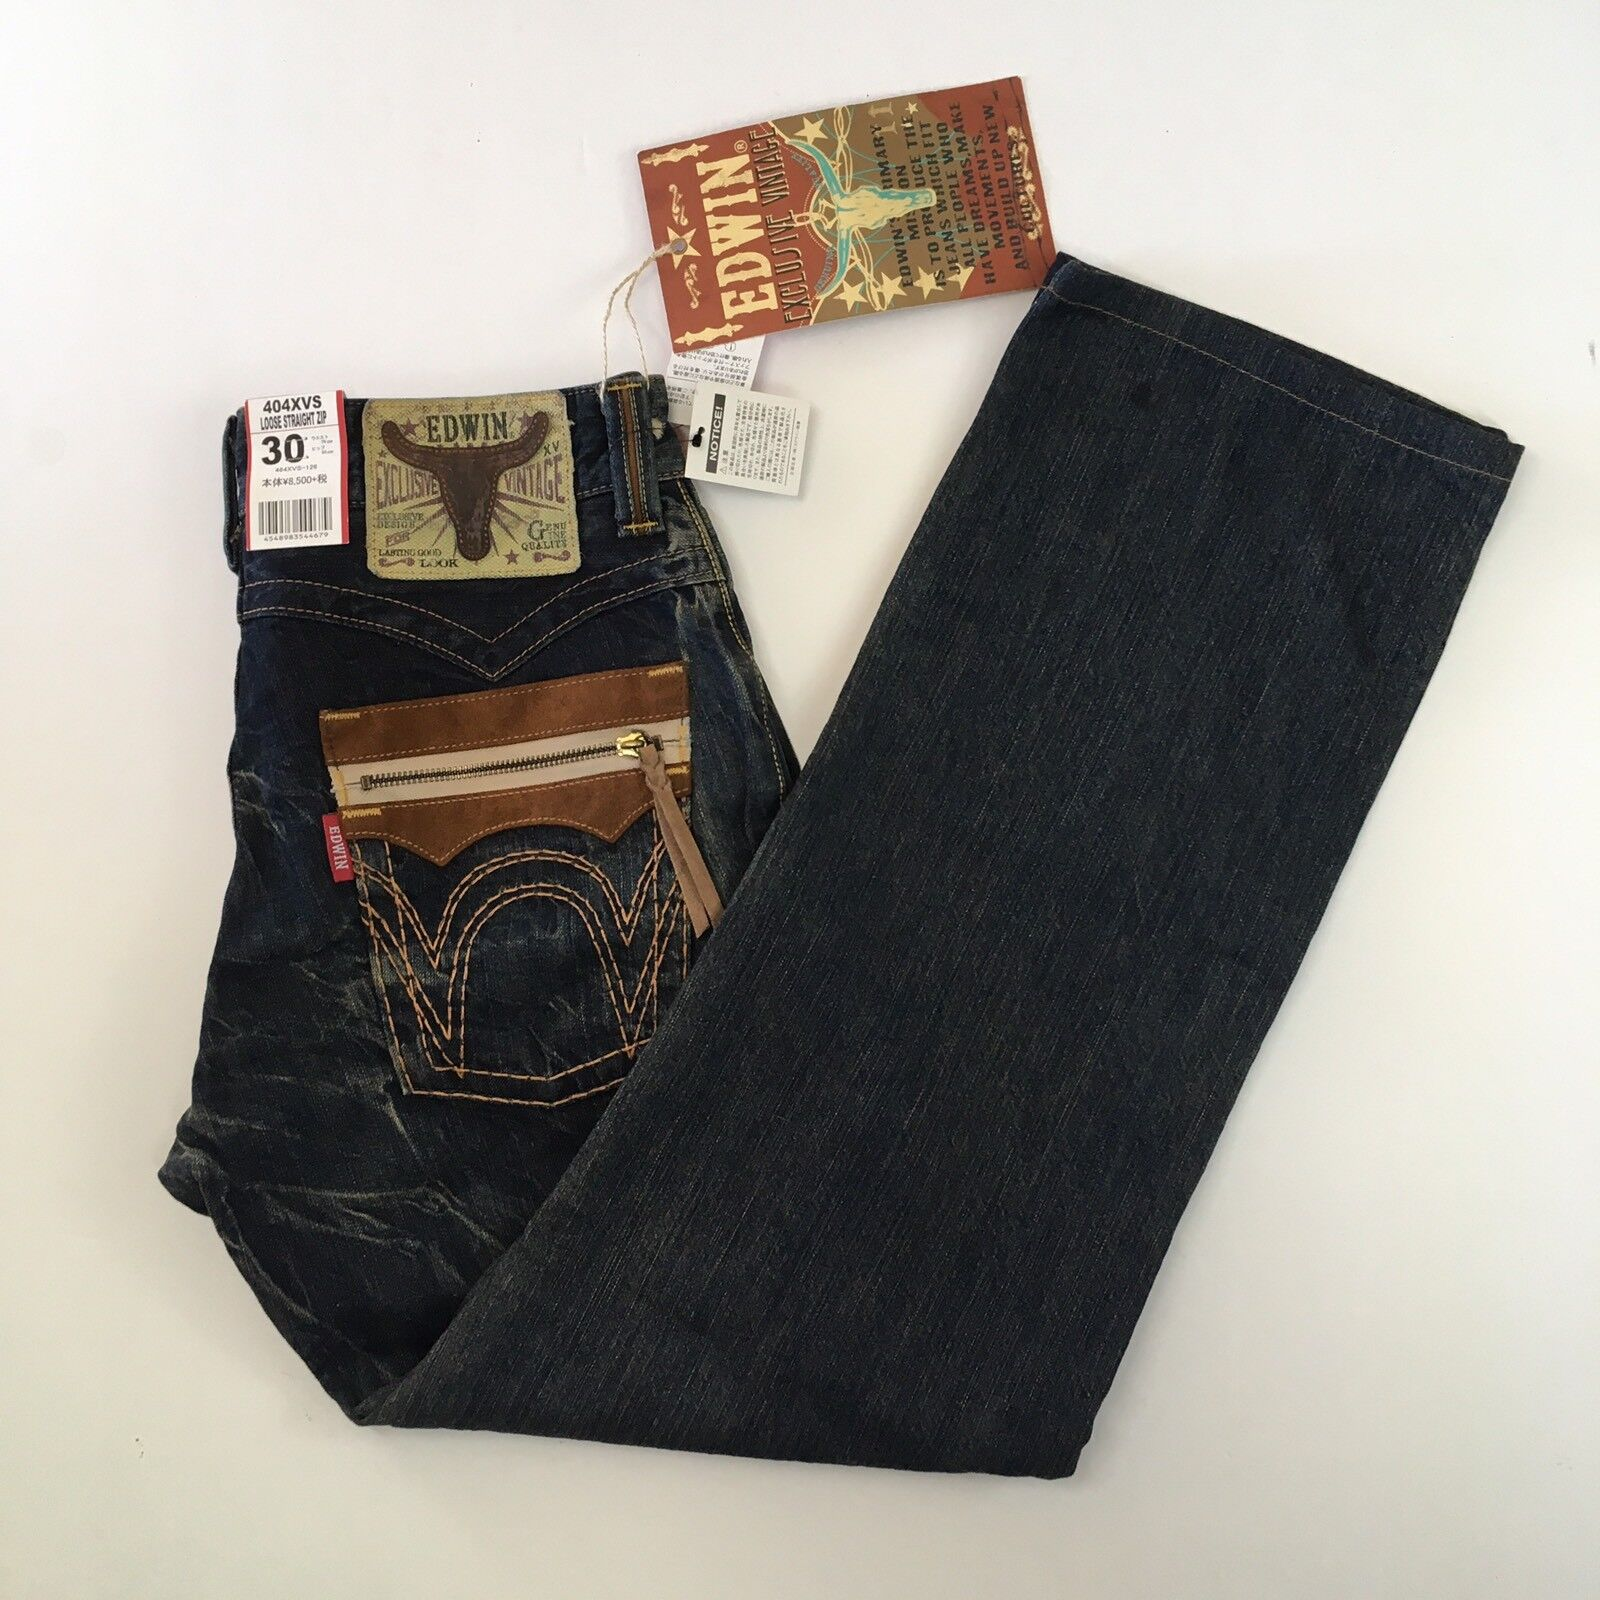 Edwin Mens Sz 30 31x30 404XVS Loose Straight Exclusive Vintage Dark bluee Jeans